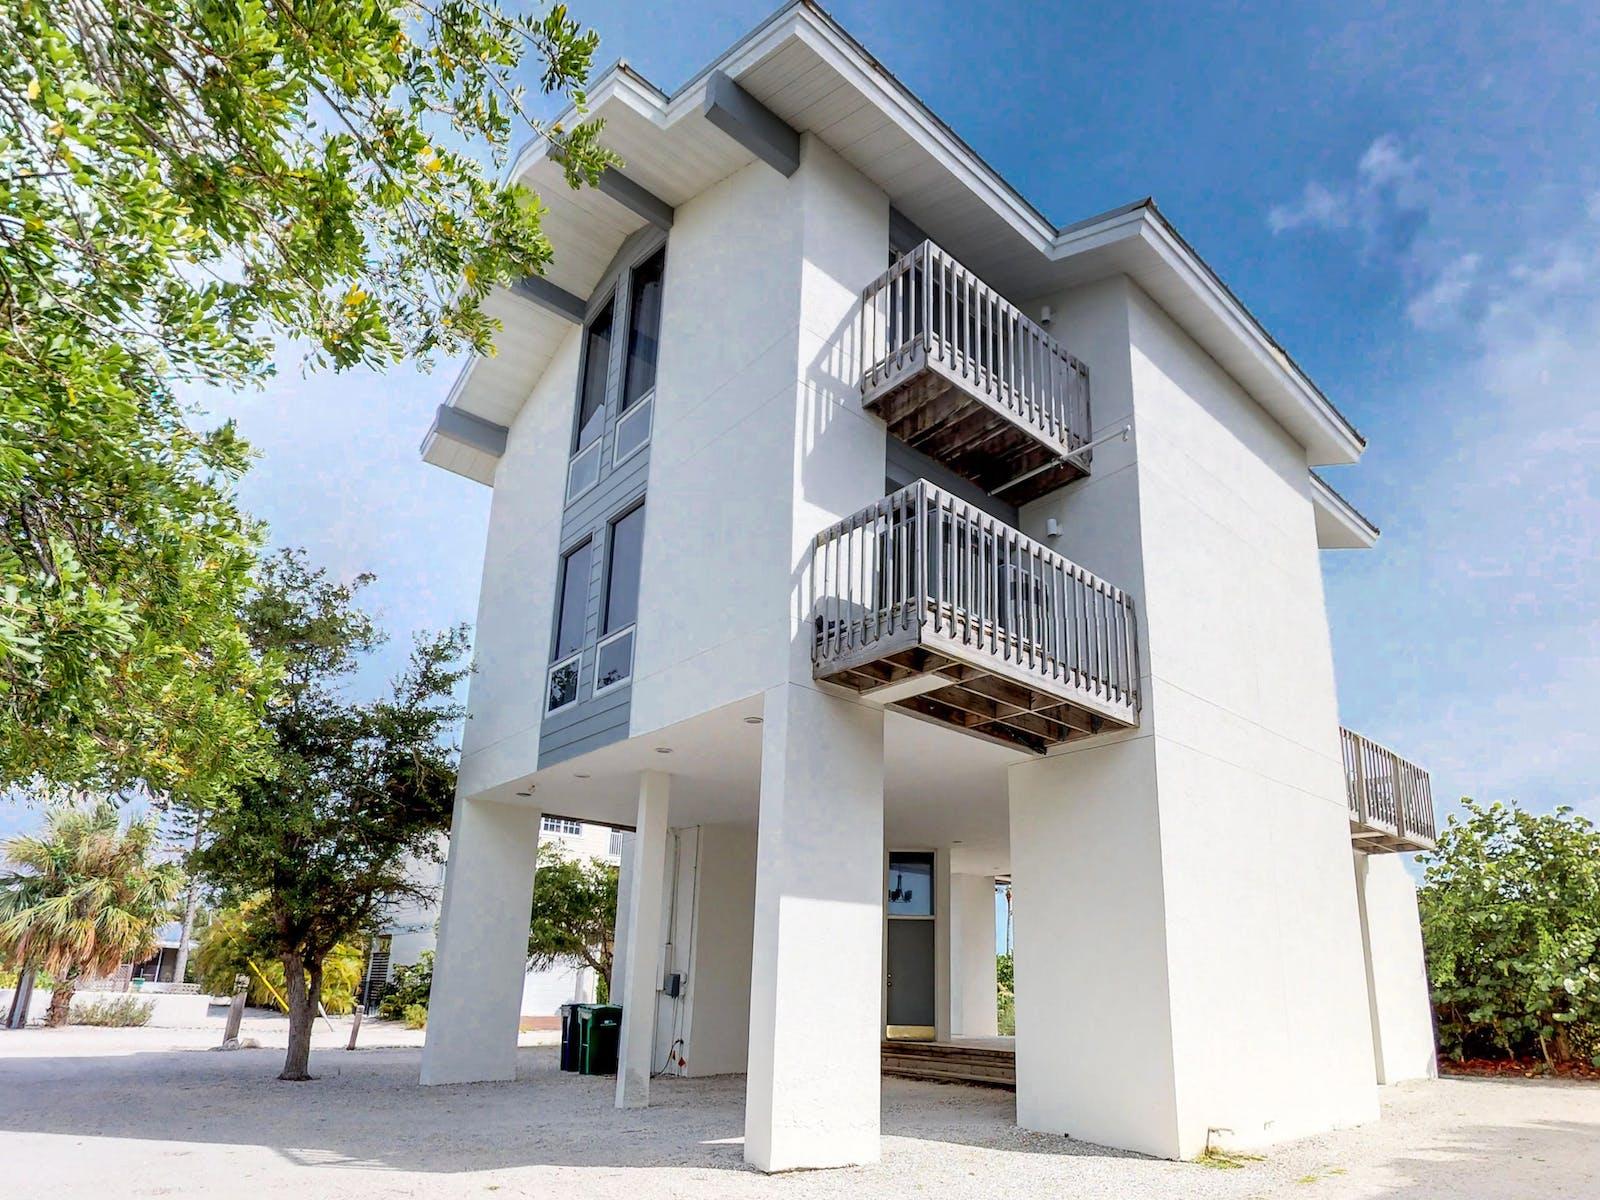 Vacation house rental in Florida Gulf Coast